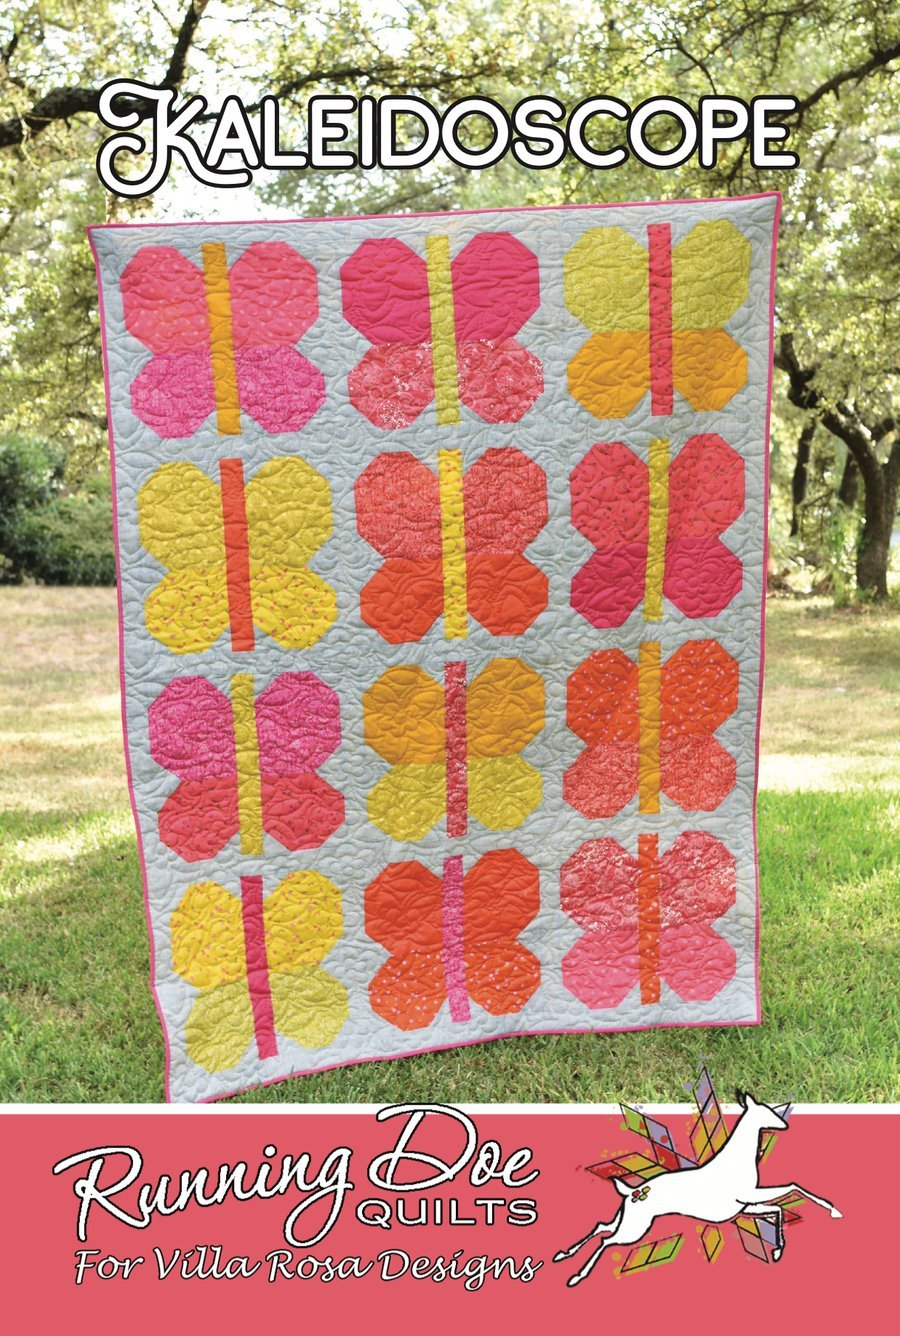 Kaleidoscope Running Doe Quilts for Villa Rosa Designs 2020  56 x 74